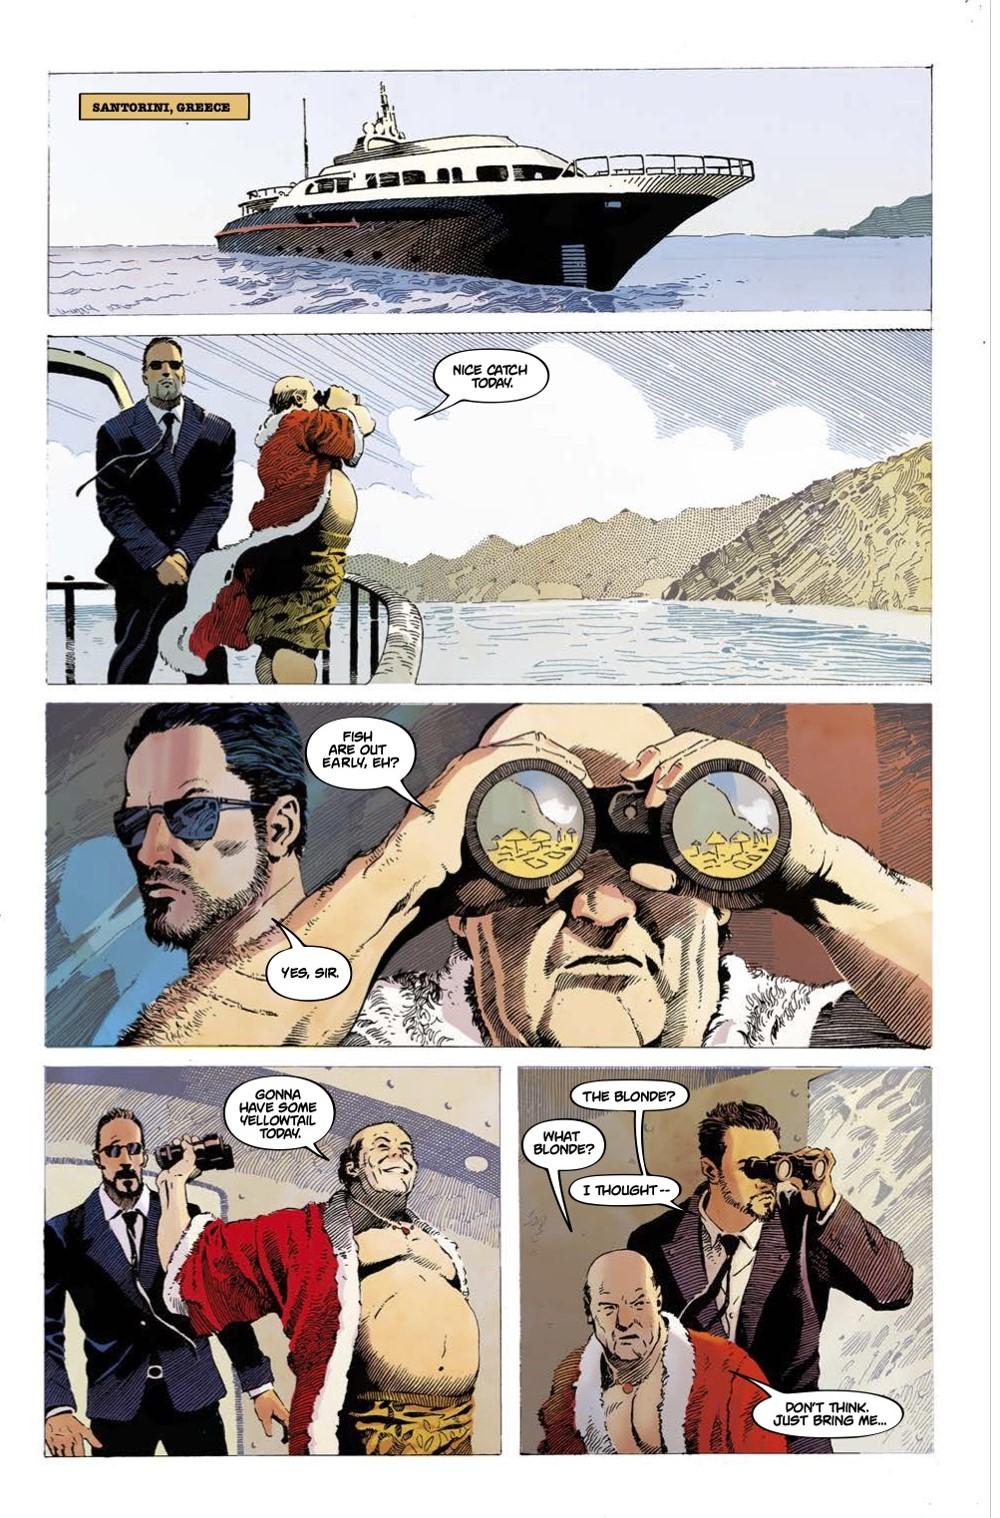 1 ComicList Previews: GUN HONEY #1